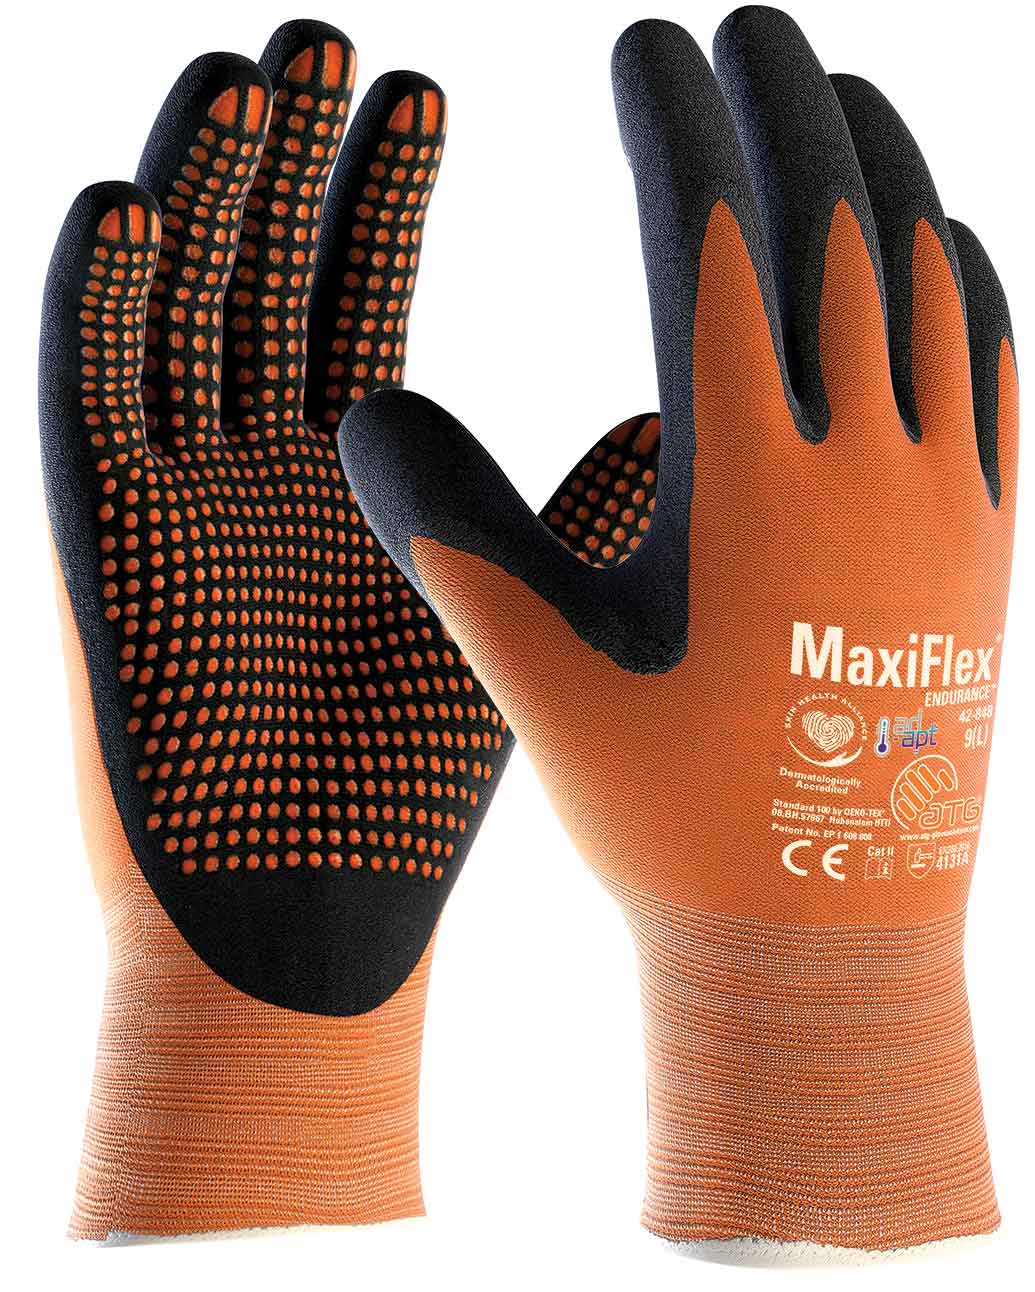 42-848 MaxiFlex® Endurance™ with AD-APT™ Image